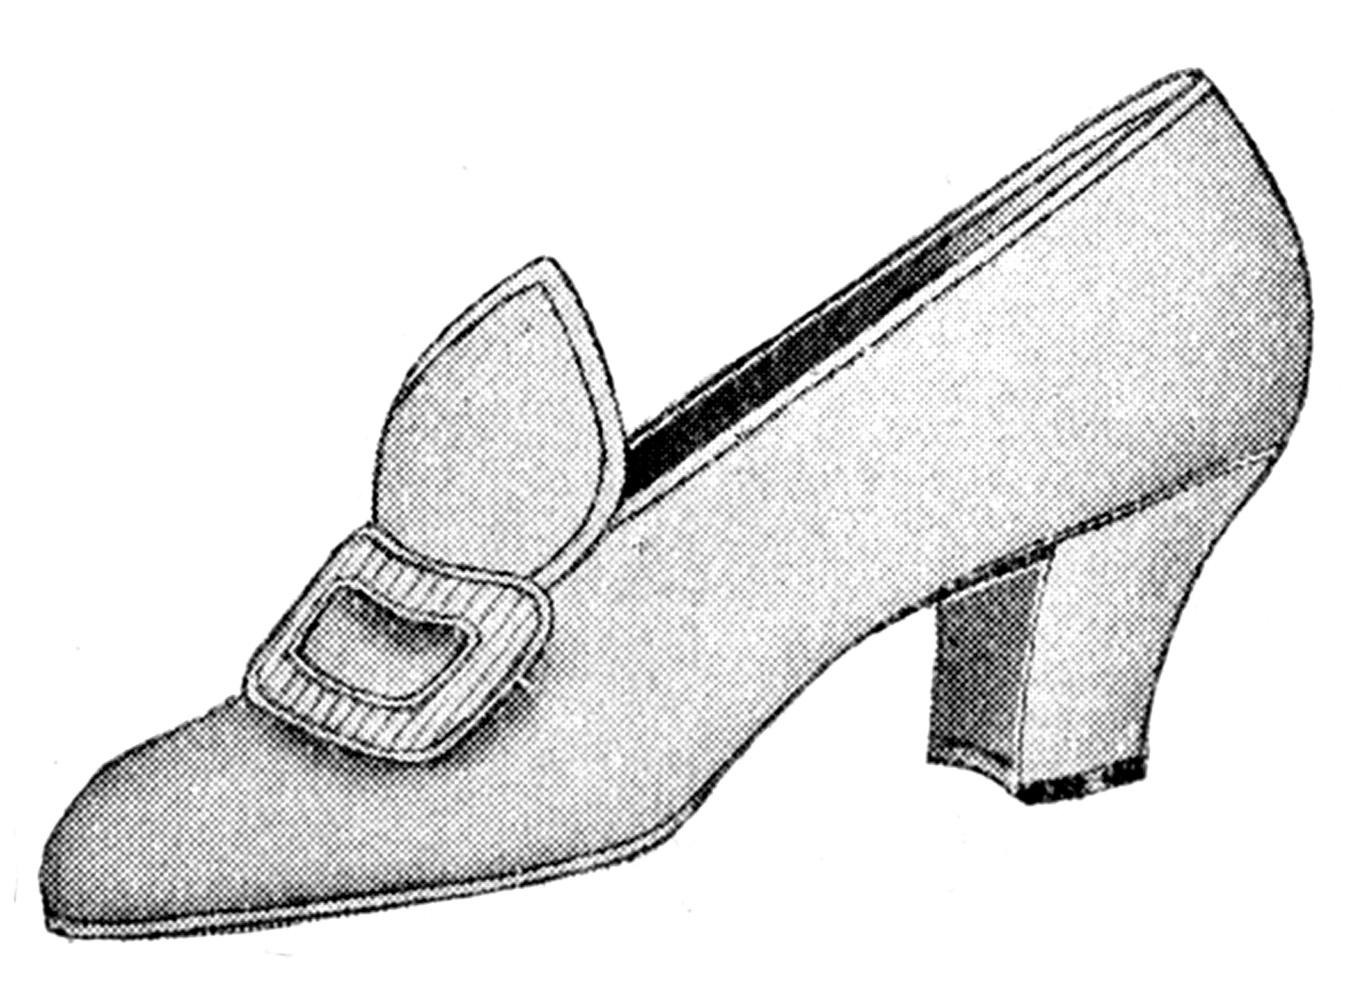 Fancy shoes clipart 3 » Clipart Station.